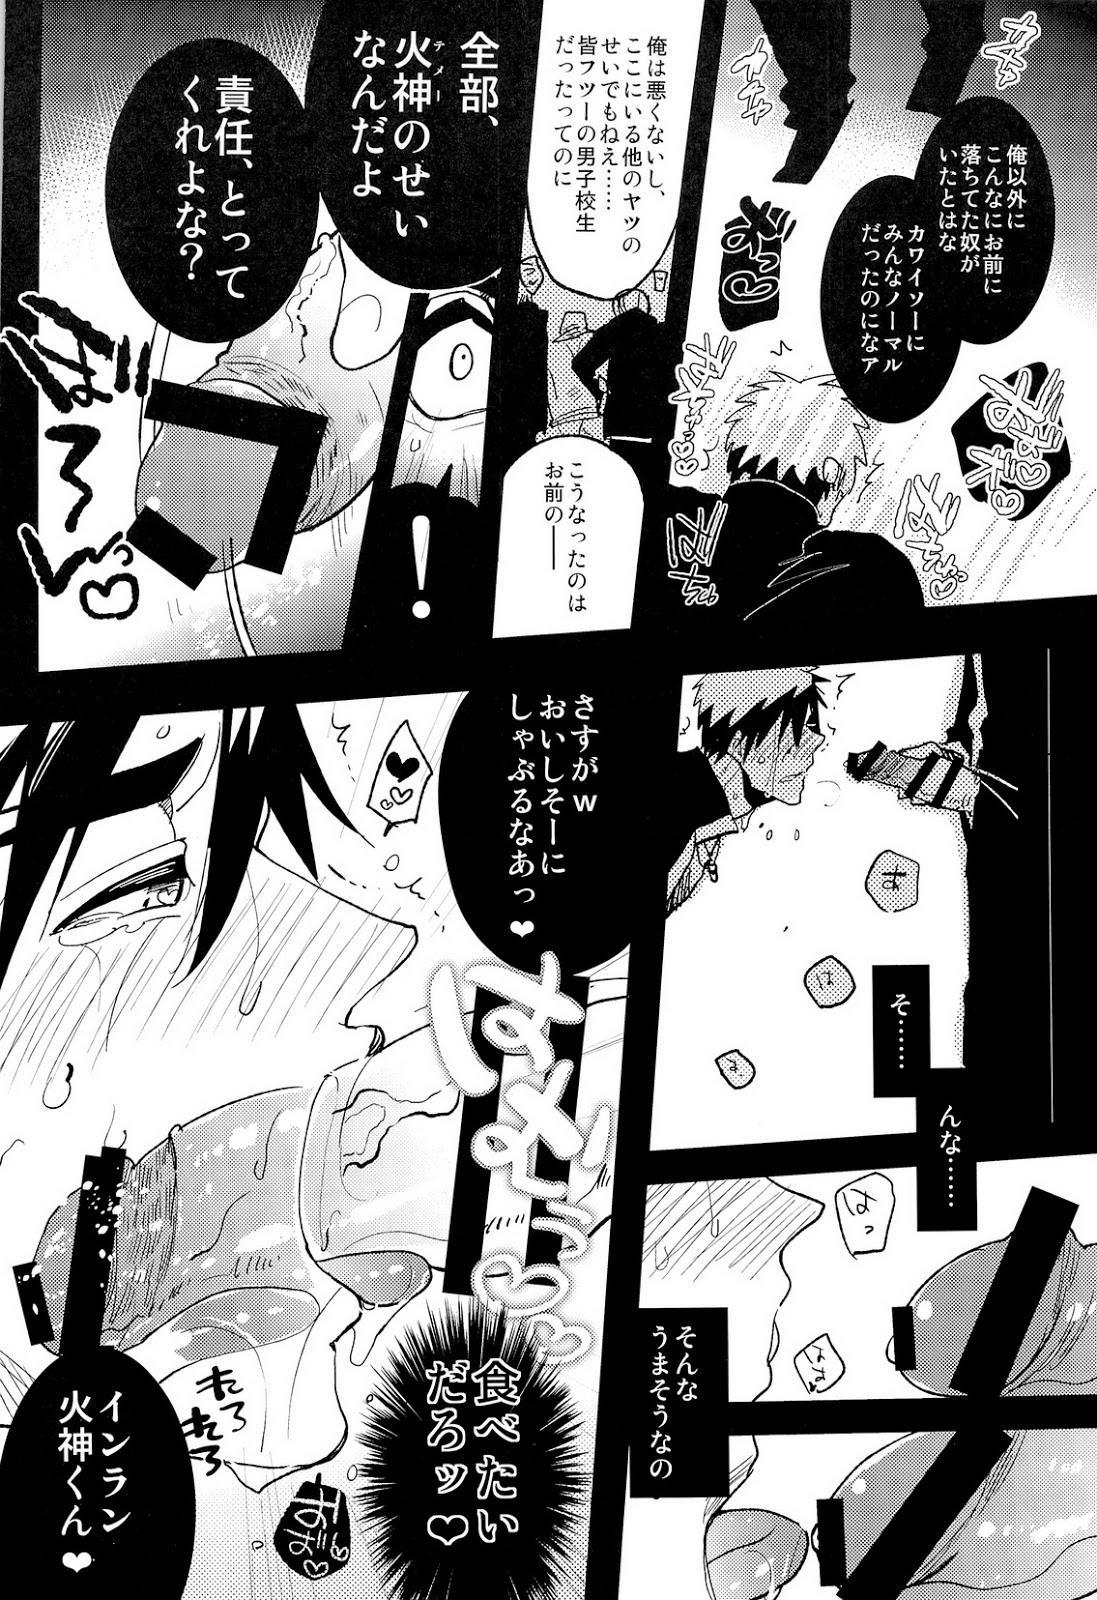 Kabejiri Hon - DK Fuck 27